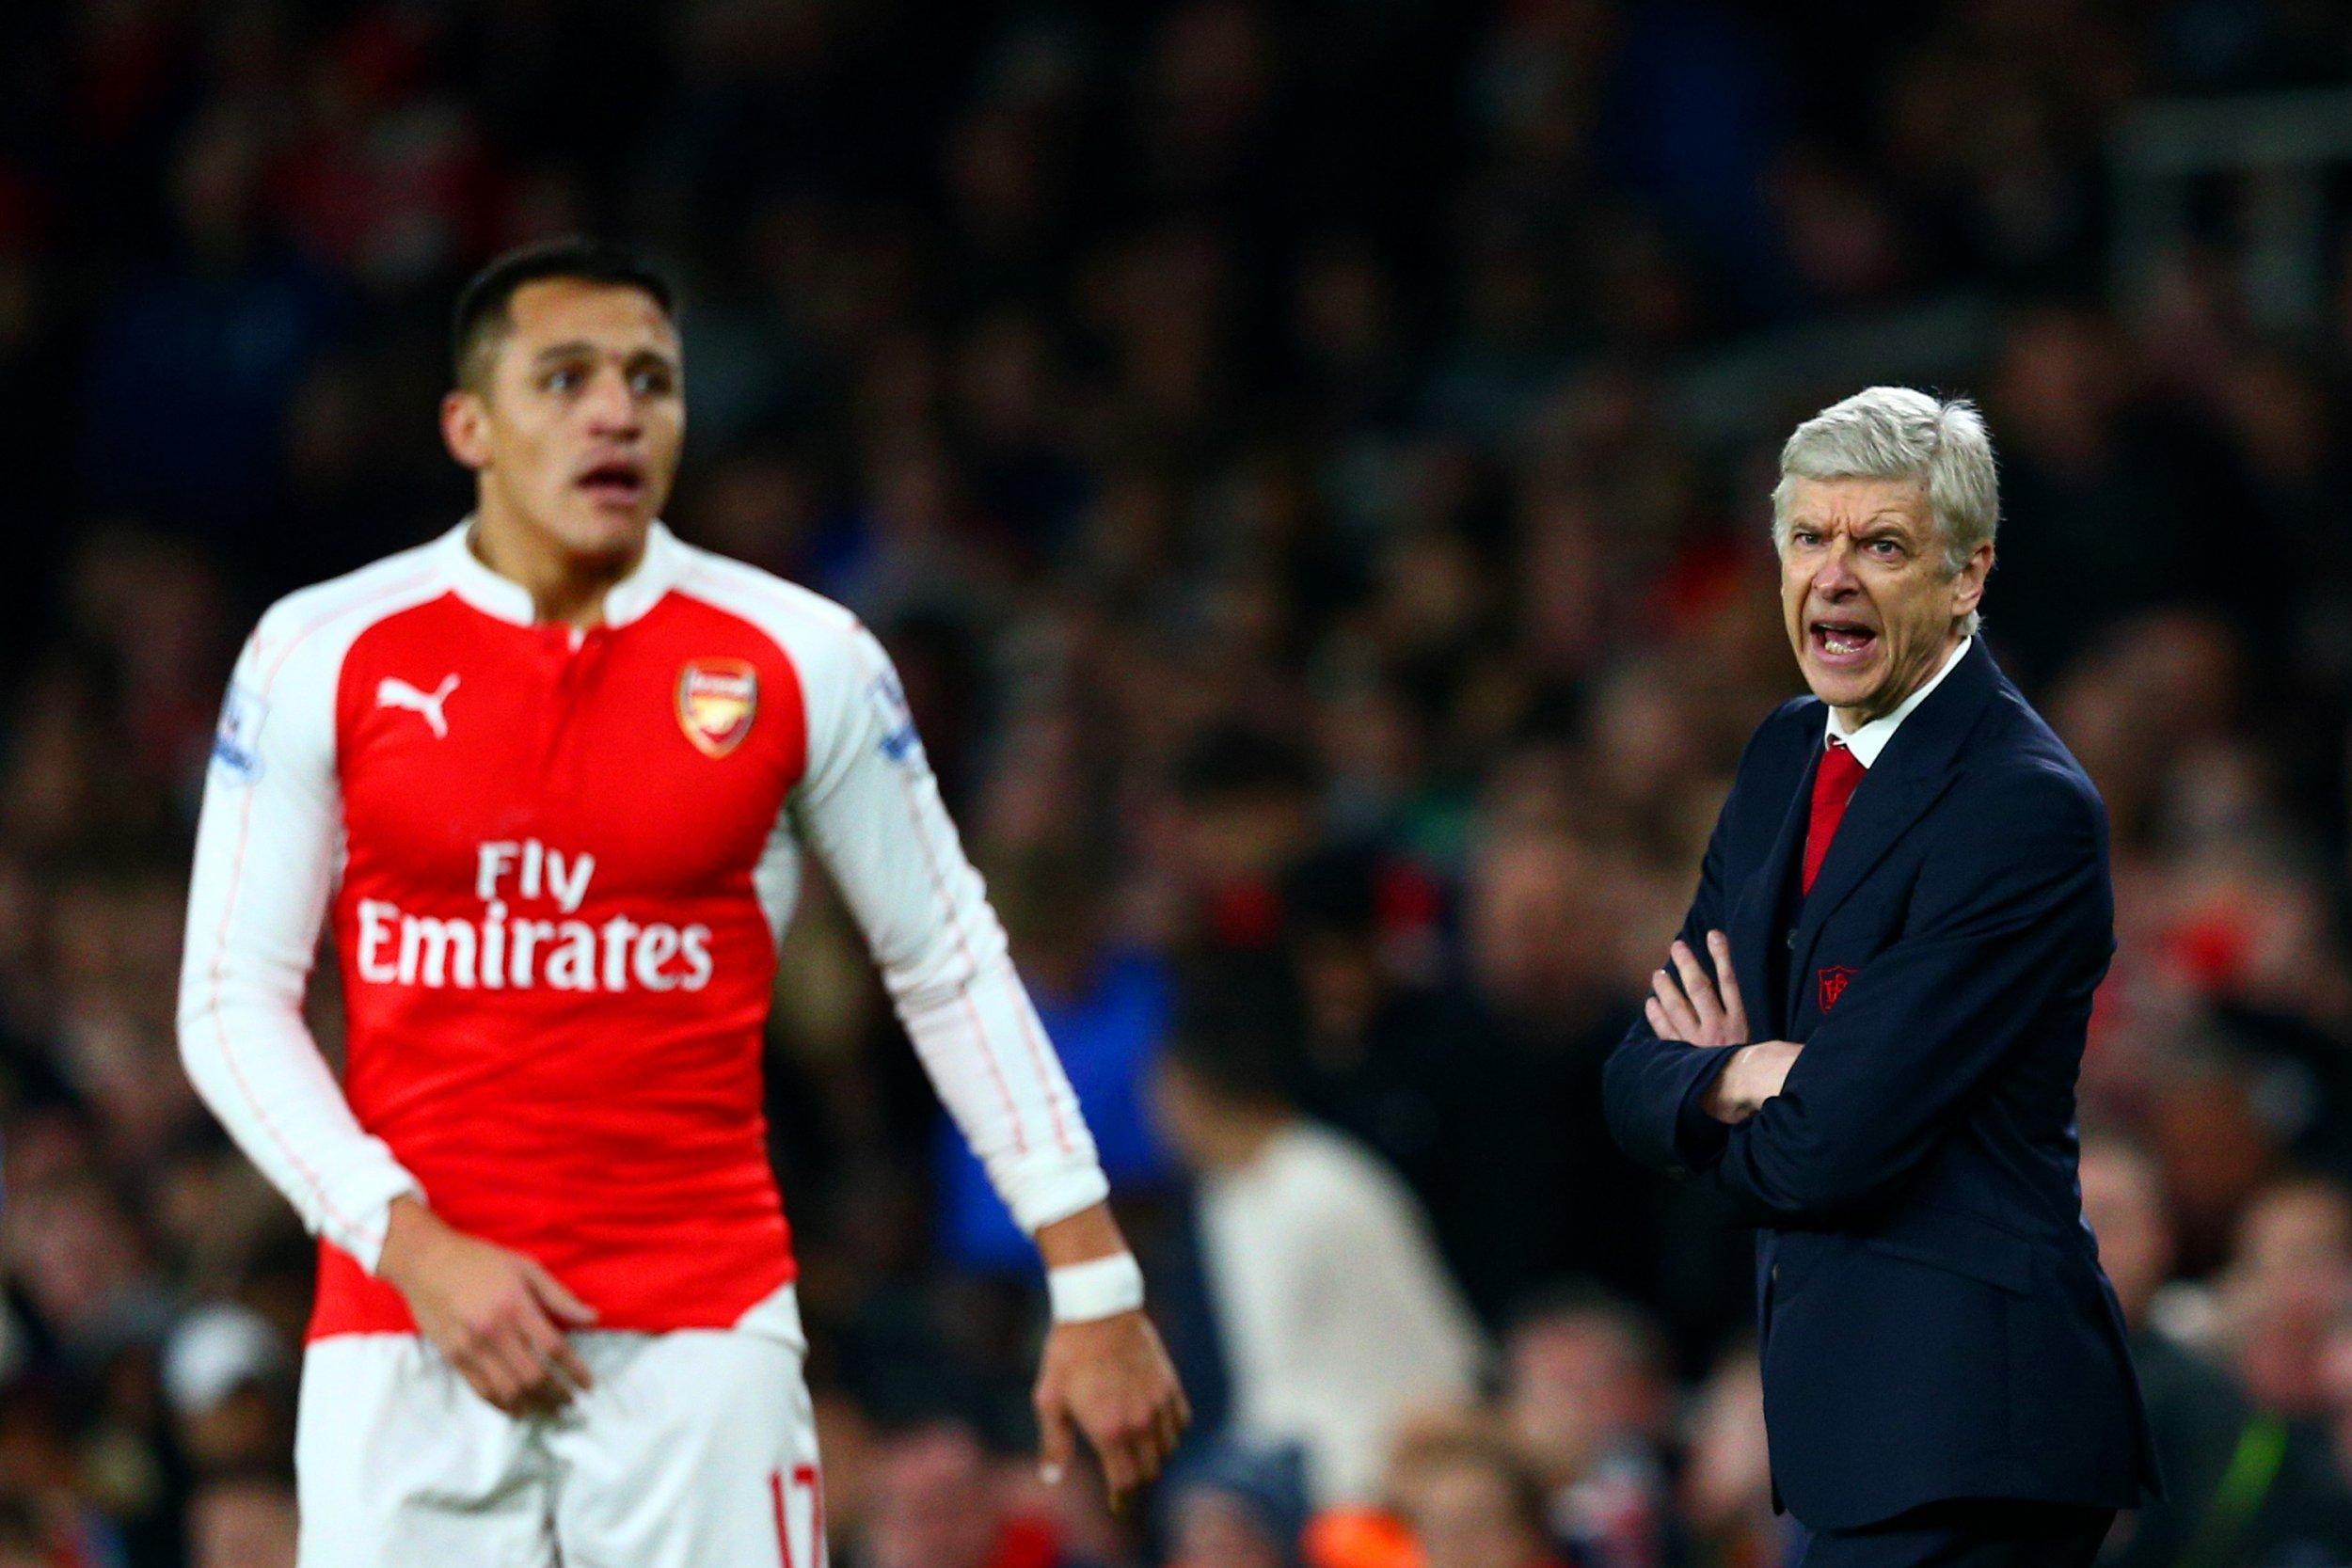 Alexis Sanchez, left, with Arsenal manager Arsene Wenger.